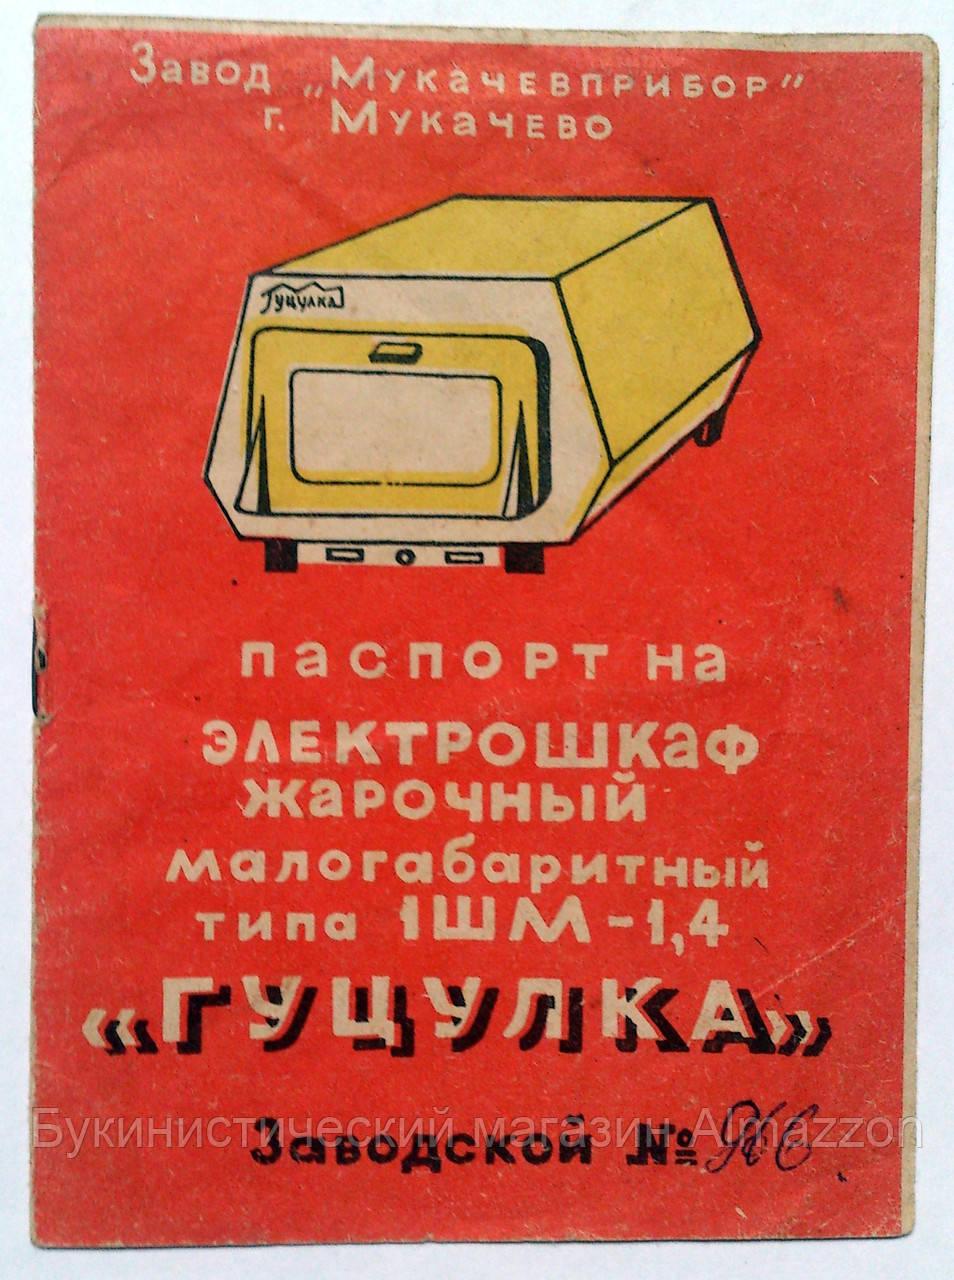 Паспорт на электрошкаф жарочный малогабаритный типа 1ШМ-1,4 «Гуцулка». Завод «Мукачевприбор»